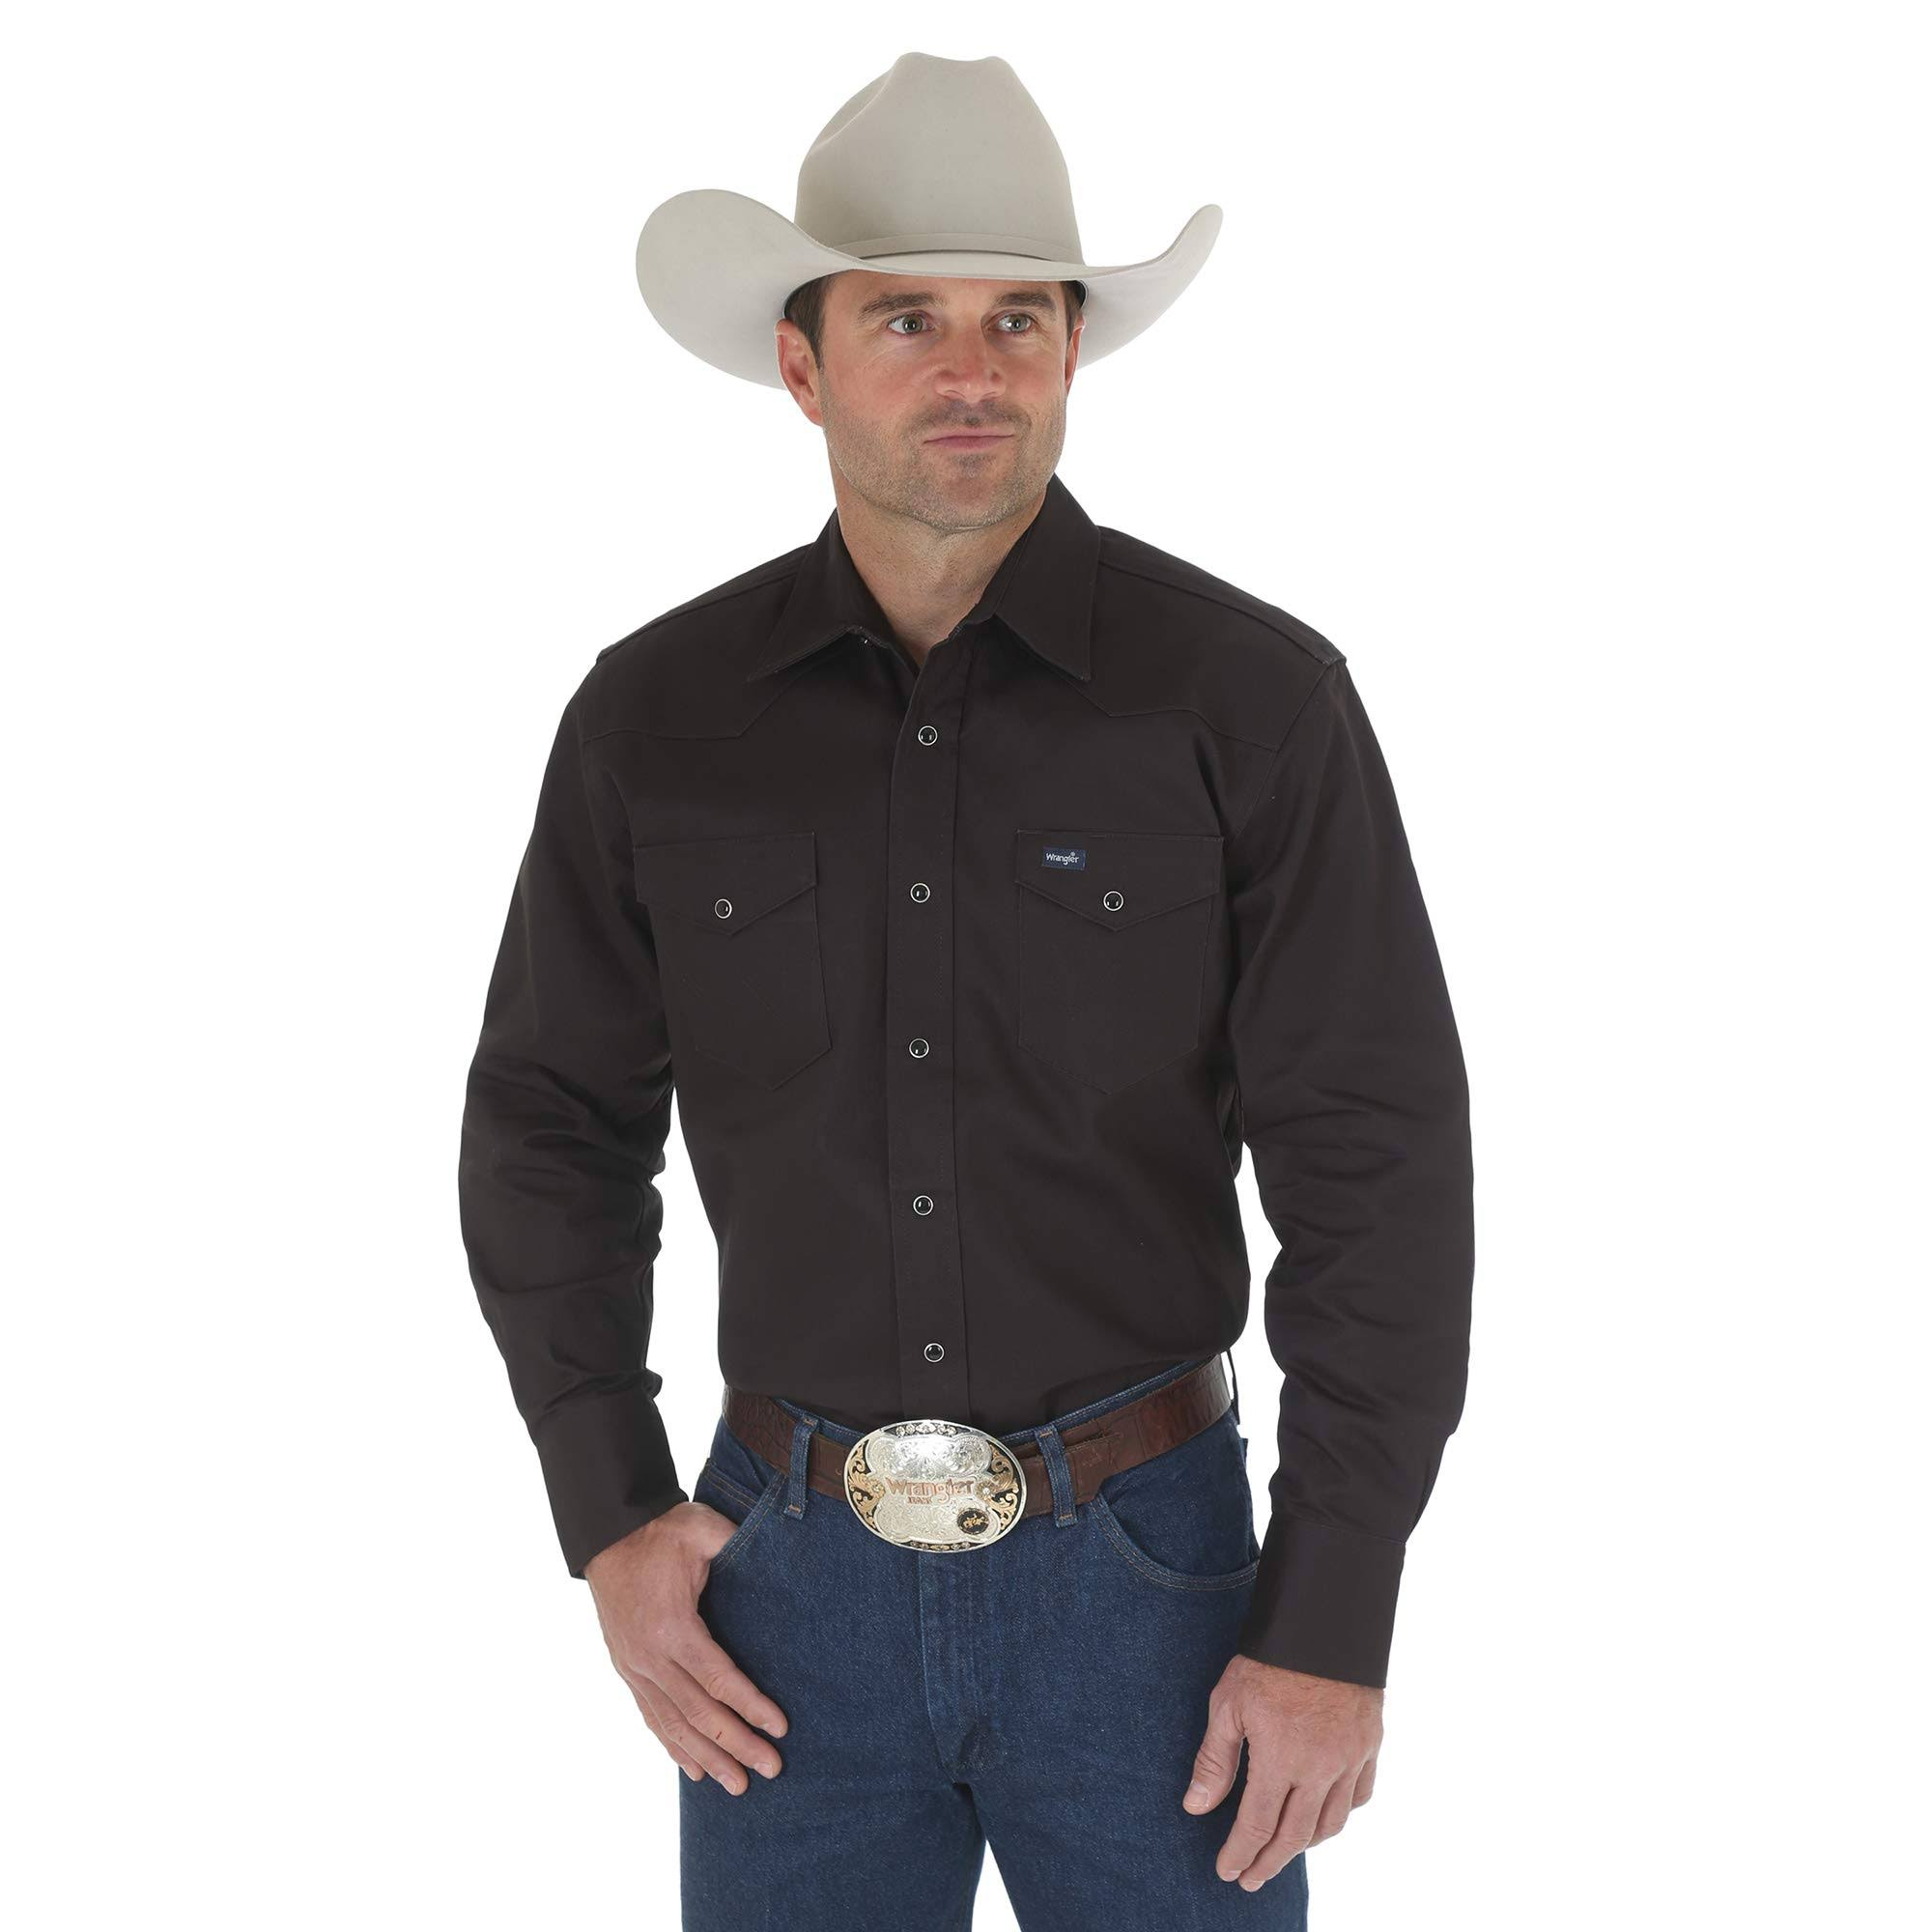 Medio Authentic Negro De Larga Regular Camisa Firme Work Western Cut Con Para Hombre Wrangler Cowboy Manga Acabado 458T6xwZn